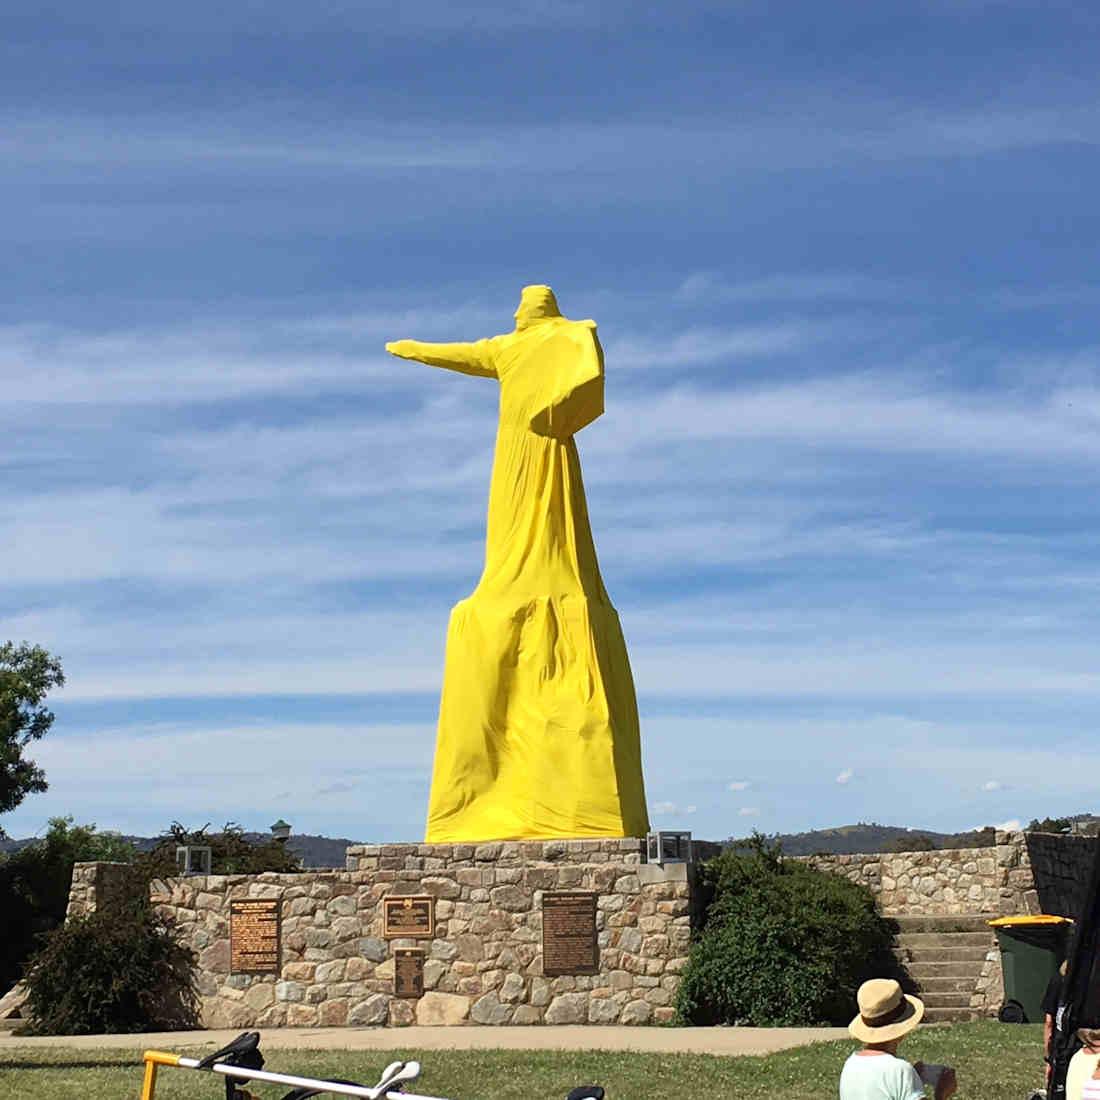 The Strzelecki Statue in Jindabyne dressed in yellow for l'Etape